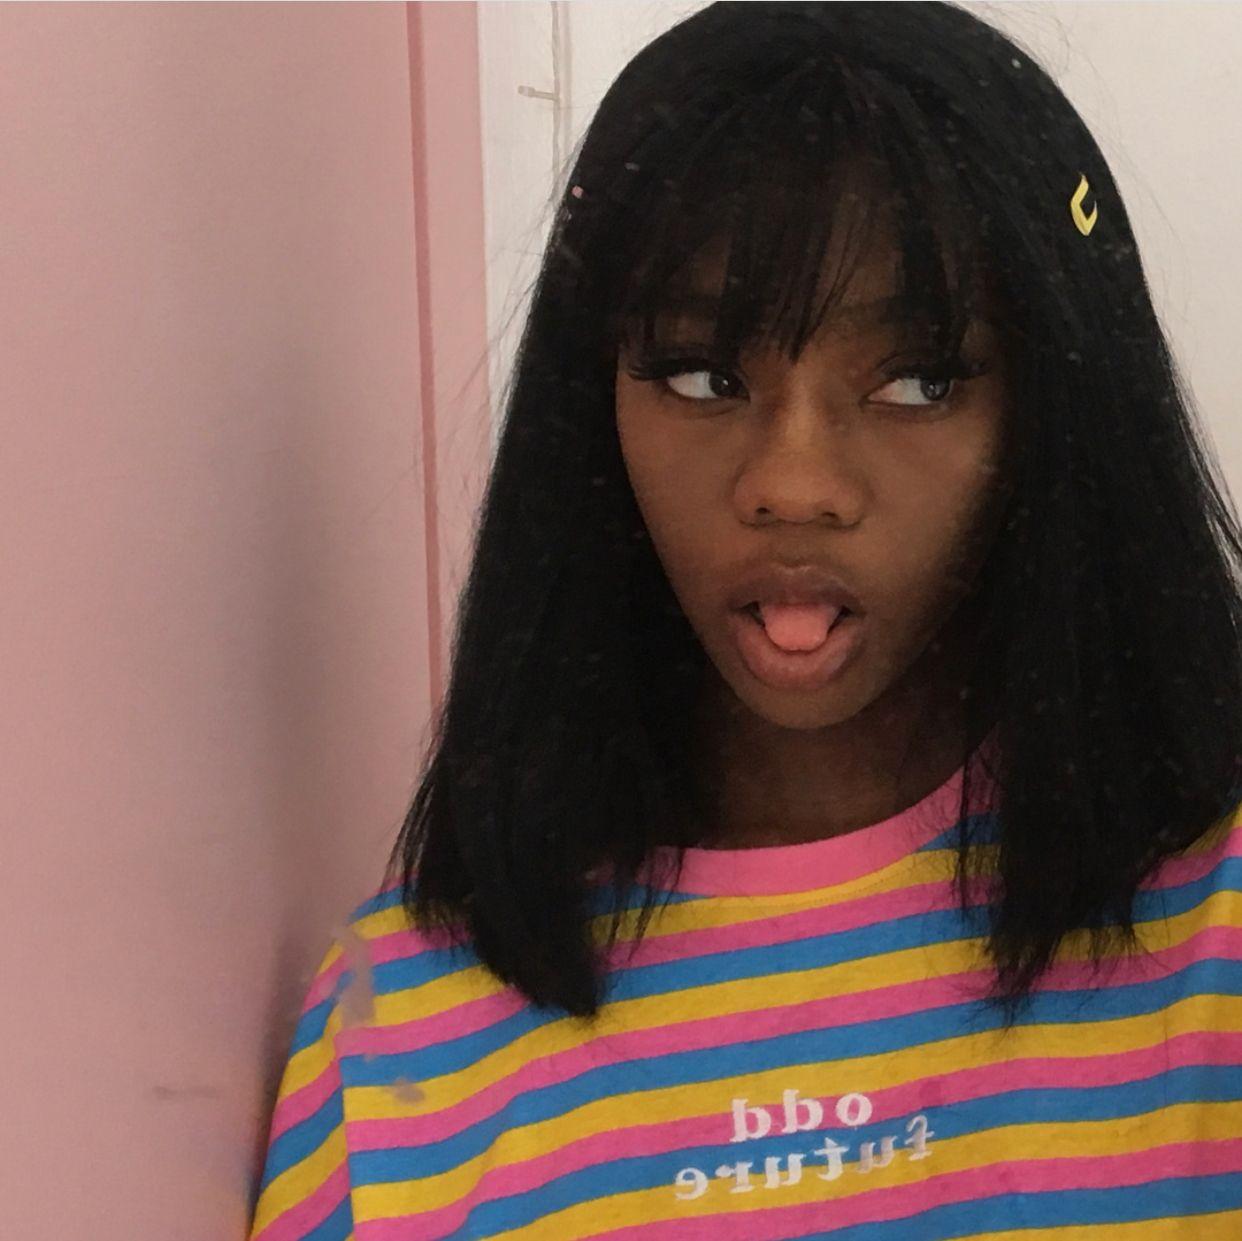 Pin By Mari On Goals Kawaii Black Girl Black Girl